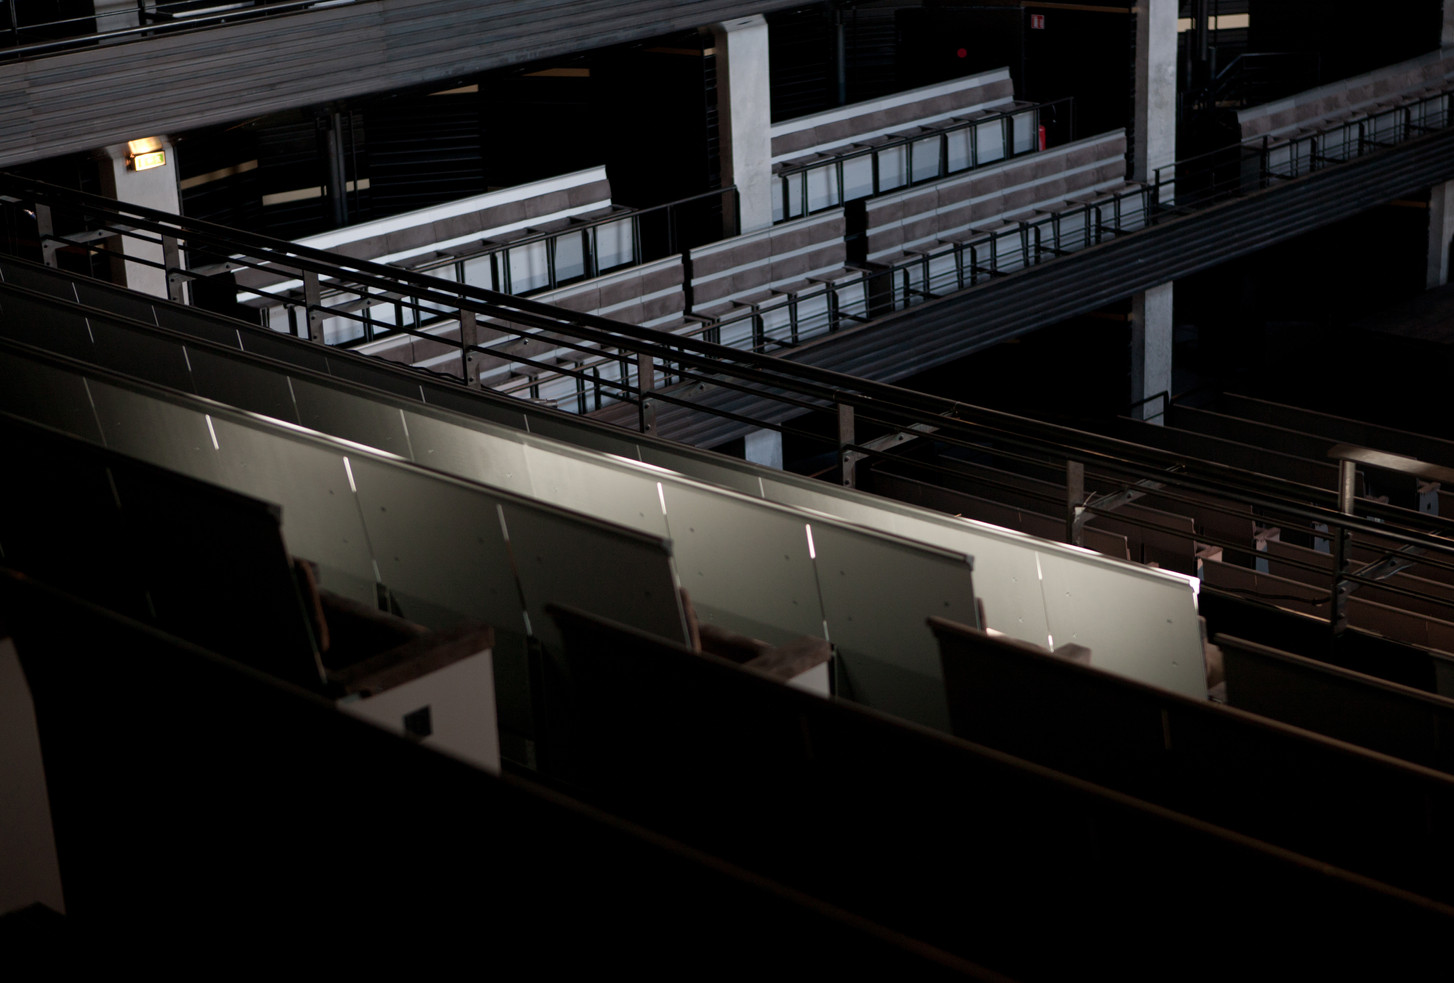 silo-0132.jpg